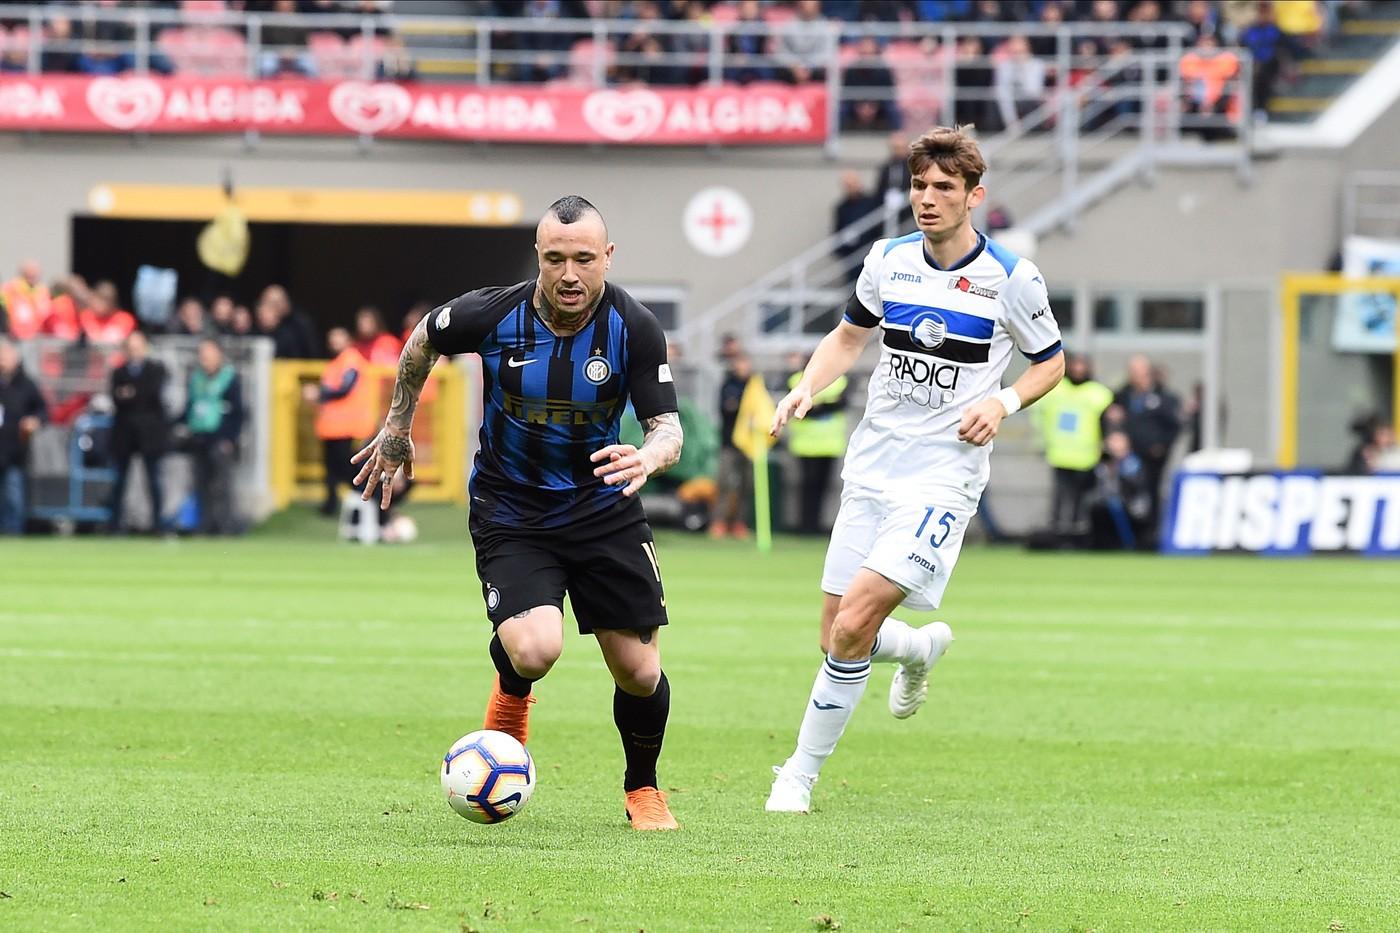 Nainggolan (Inter) Foto Claudio Grassi/LaPresse